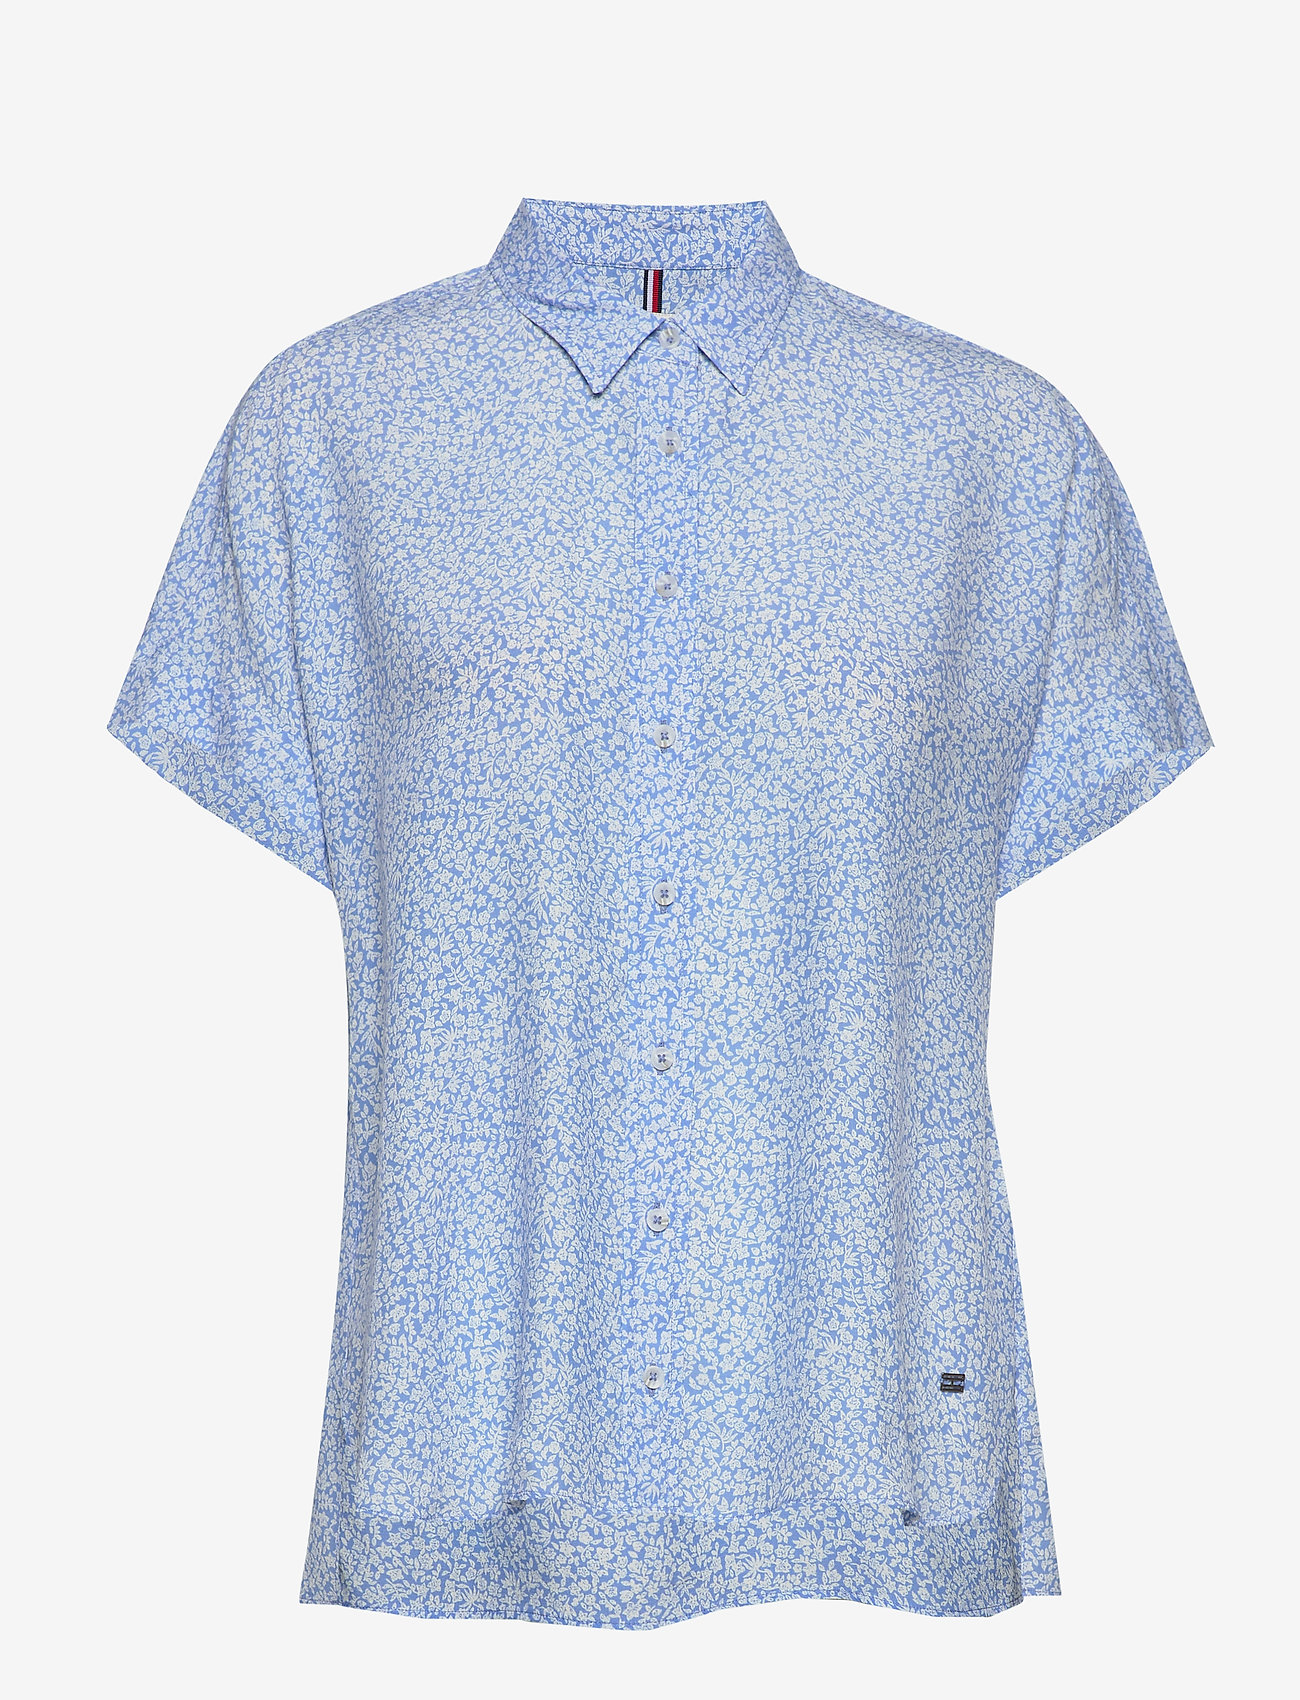 Tommy Hilfiger - RAELIN SHIRT SS - koszule z krótkim rękawem - ditsy floral light iris blue - 0